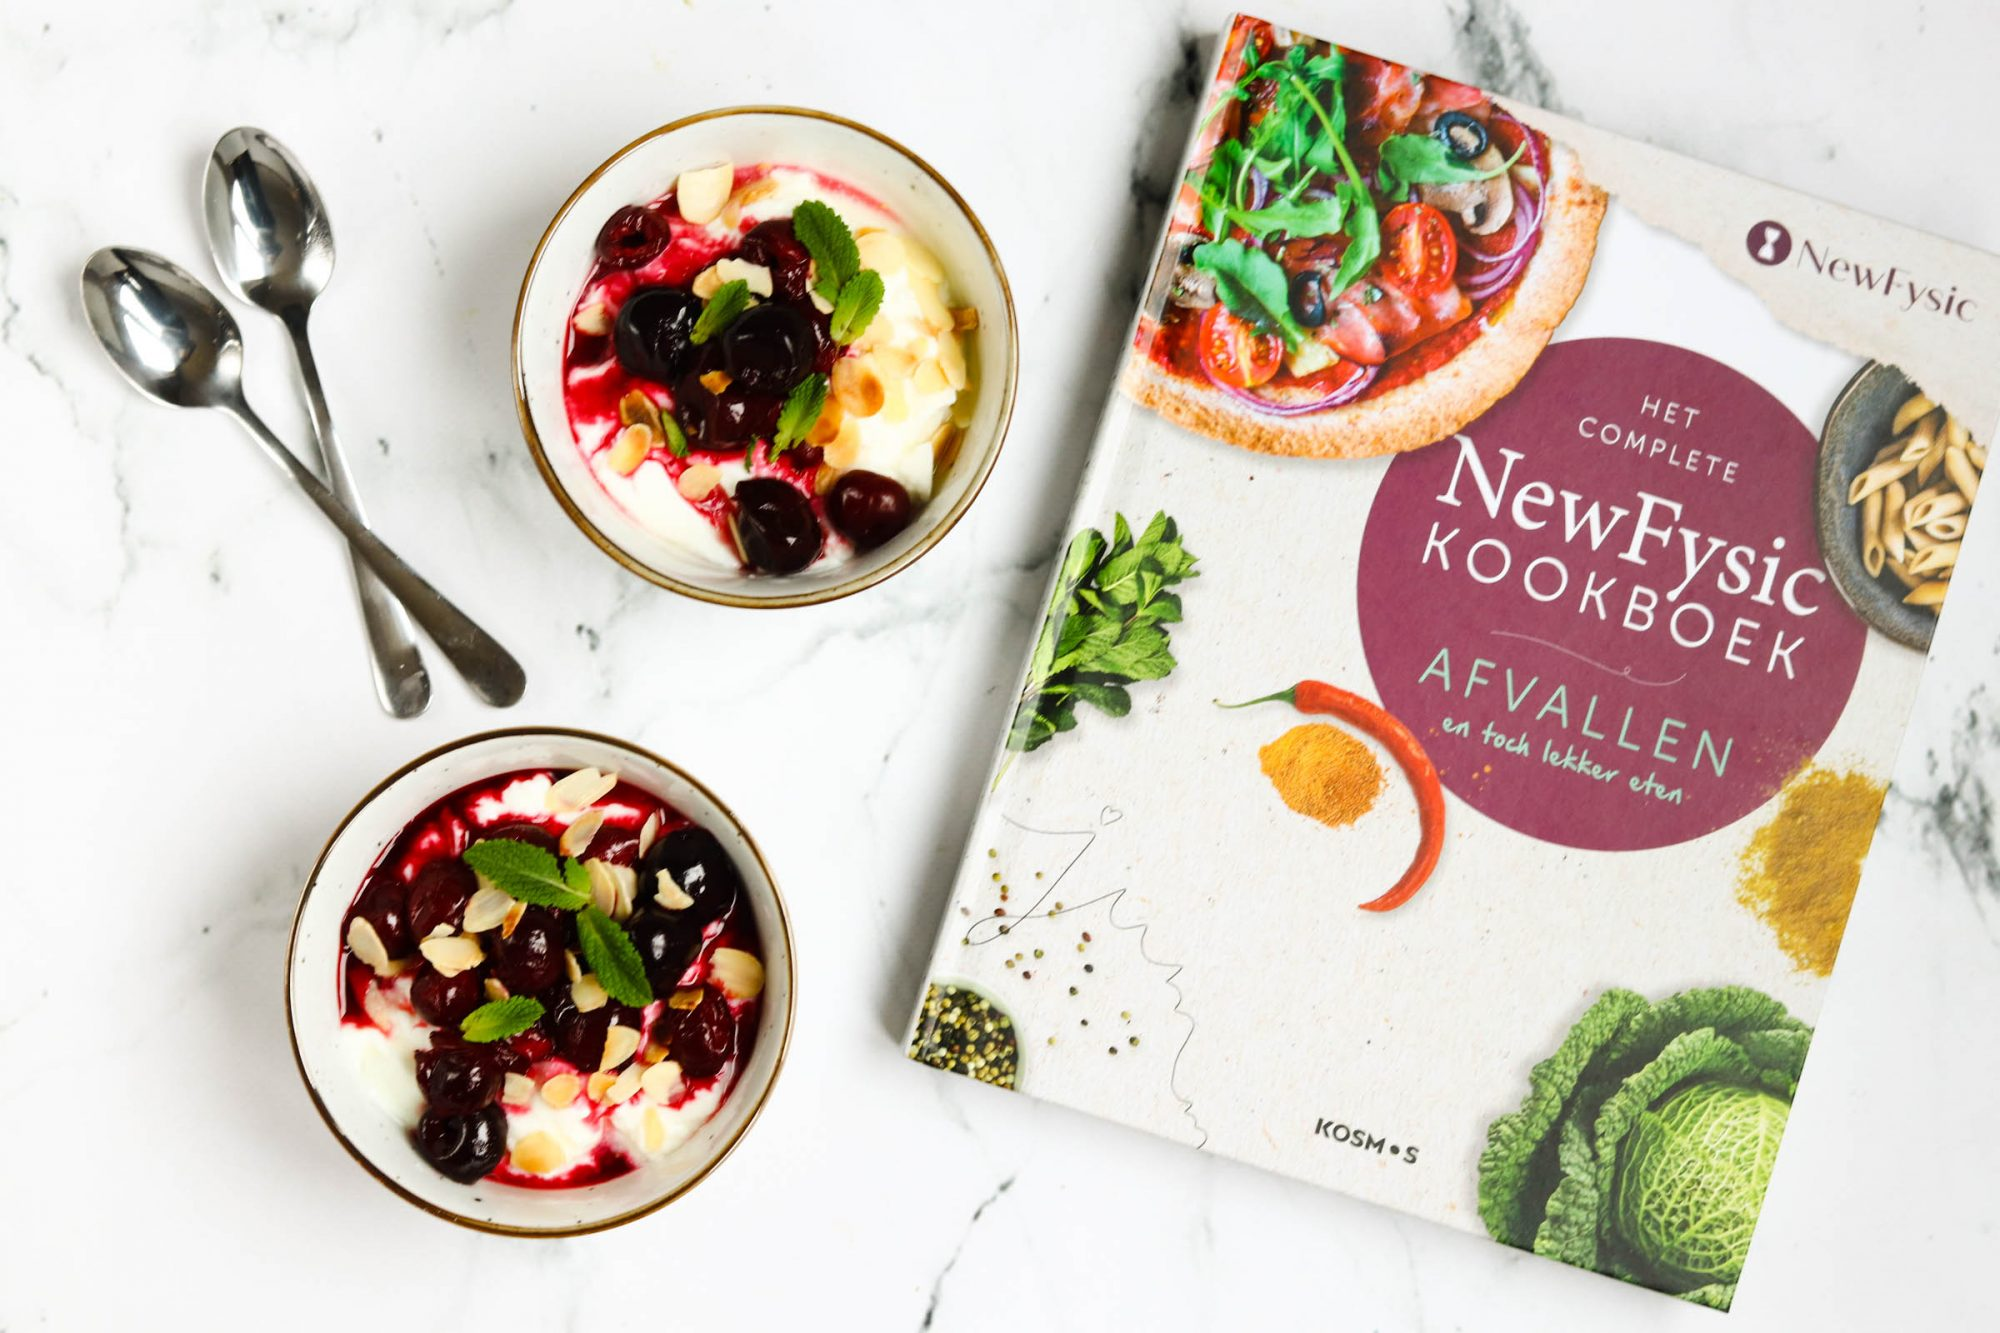 Het complete NewFysic Kookboek'